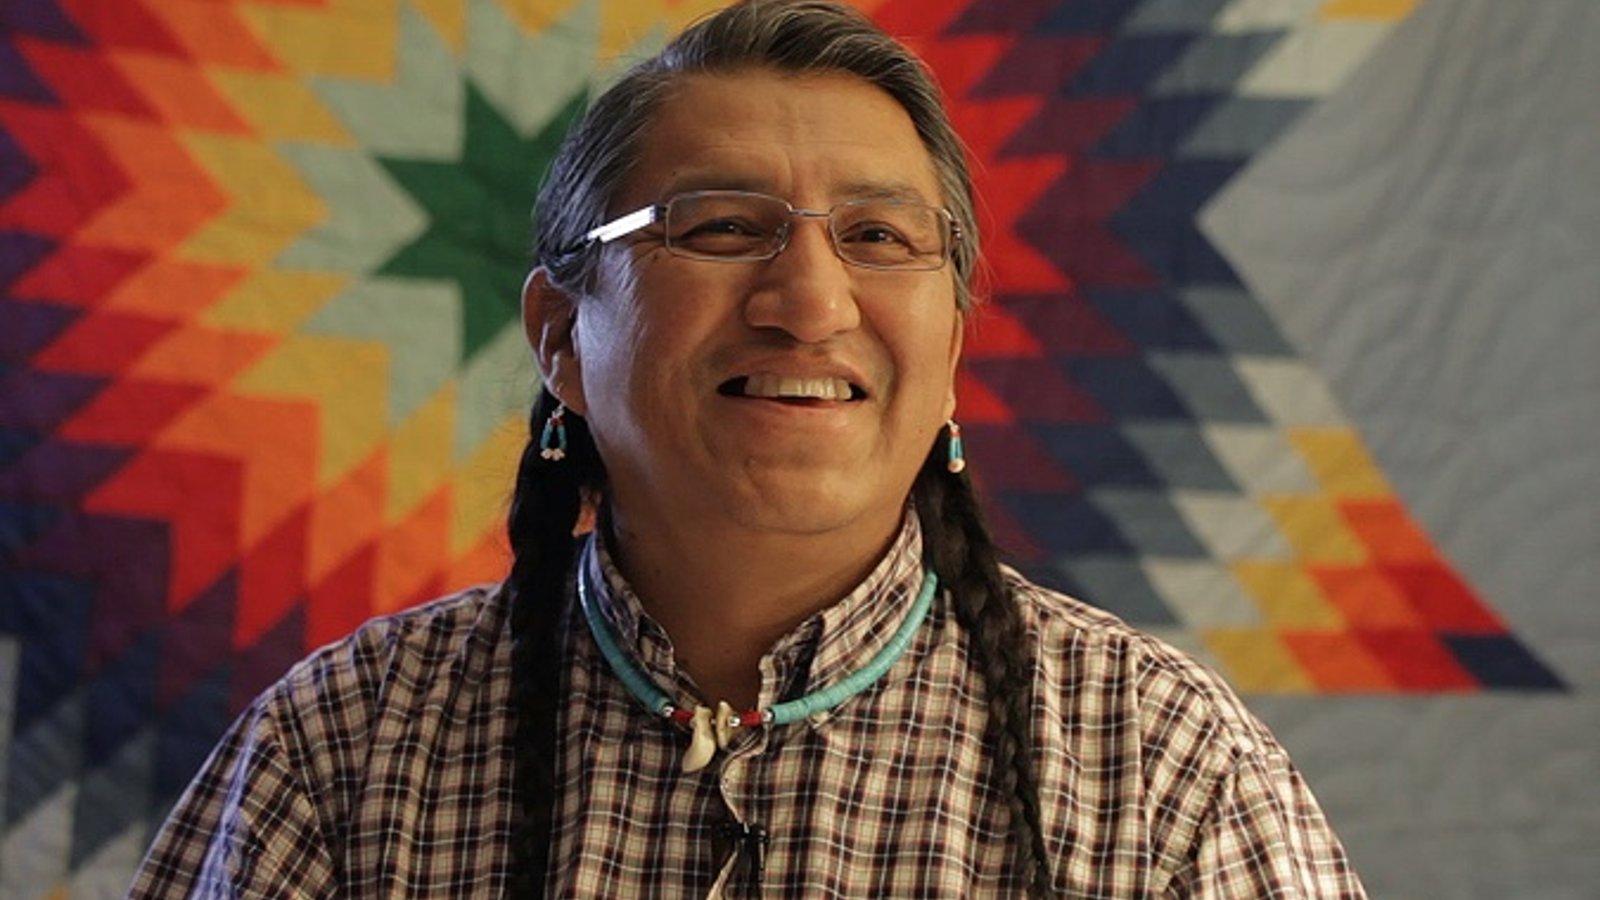 Across the Creek - The Lakota People Regaining Traditional Values